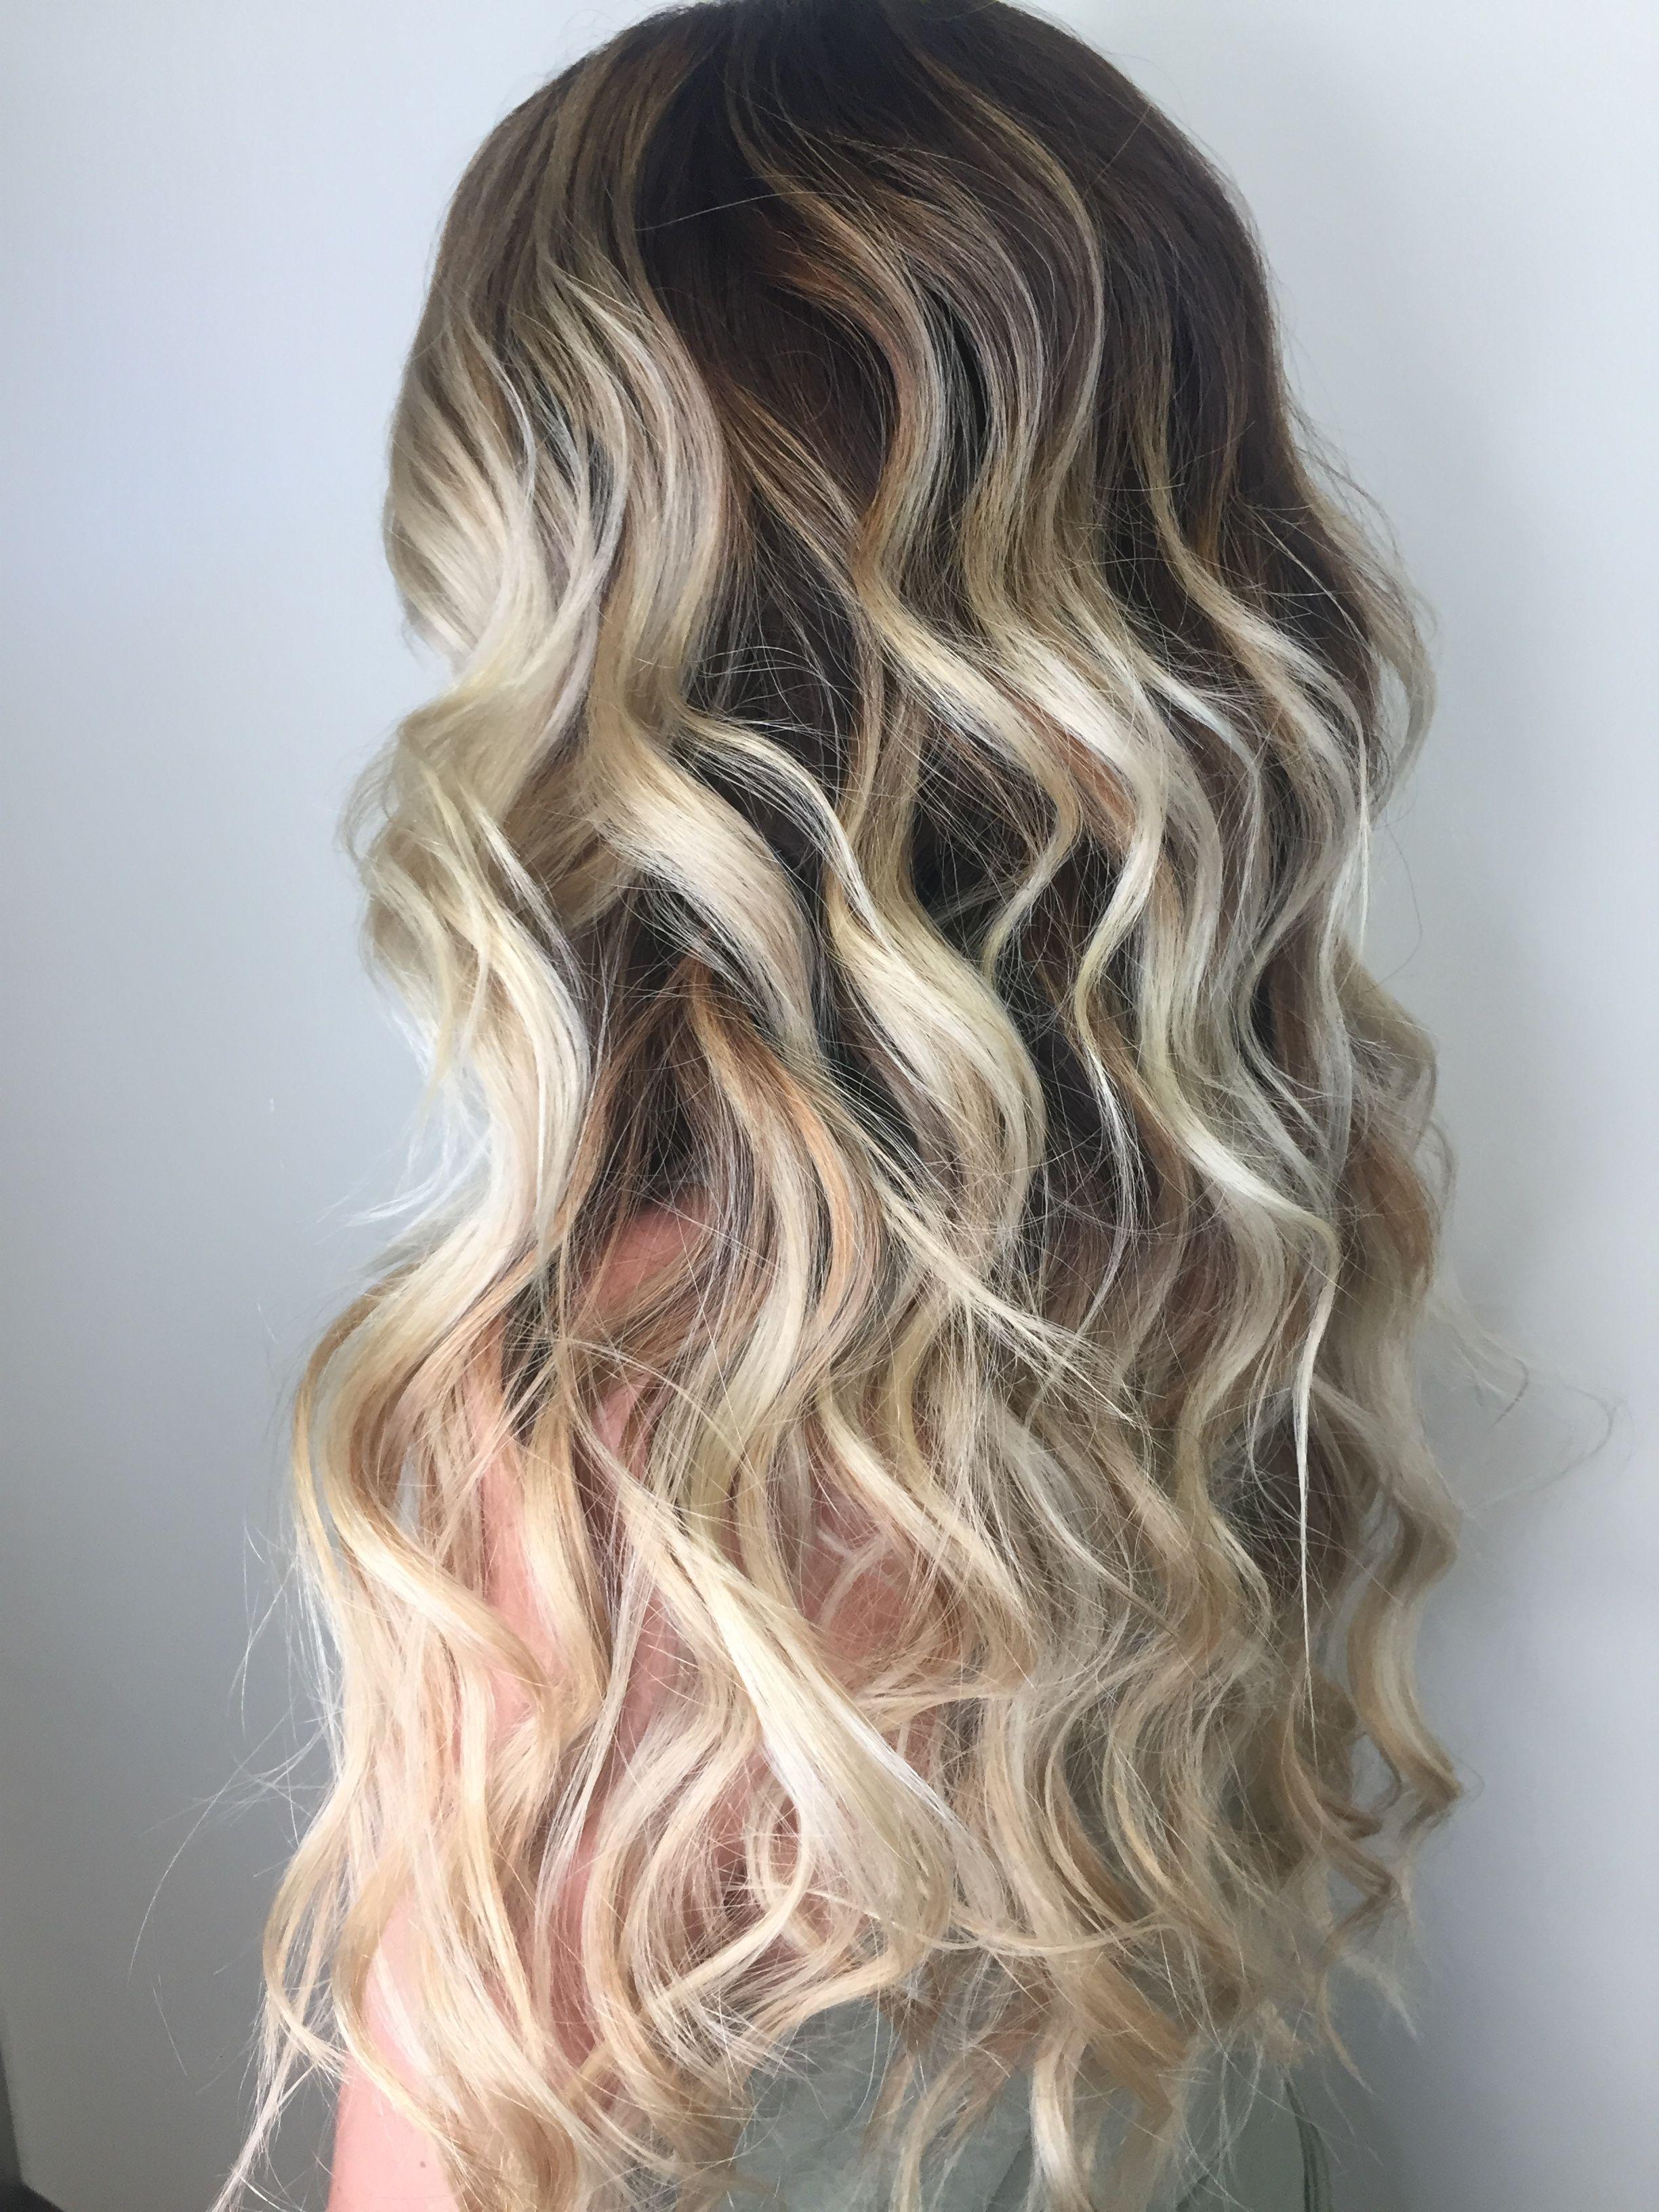 Carriemarginian Hair Beach Waves Blonde Hair Ideas Ombre Long Hair Waves Wedding Hairstyles For Long Hair Beach Wave Hair